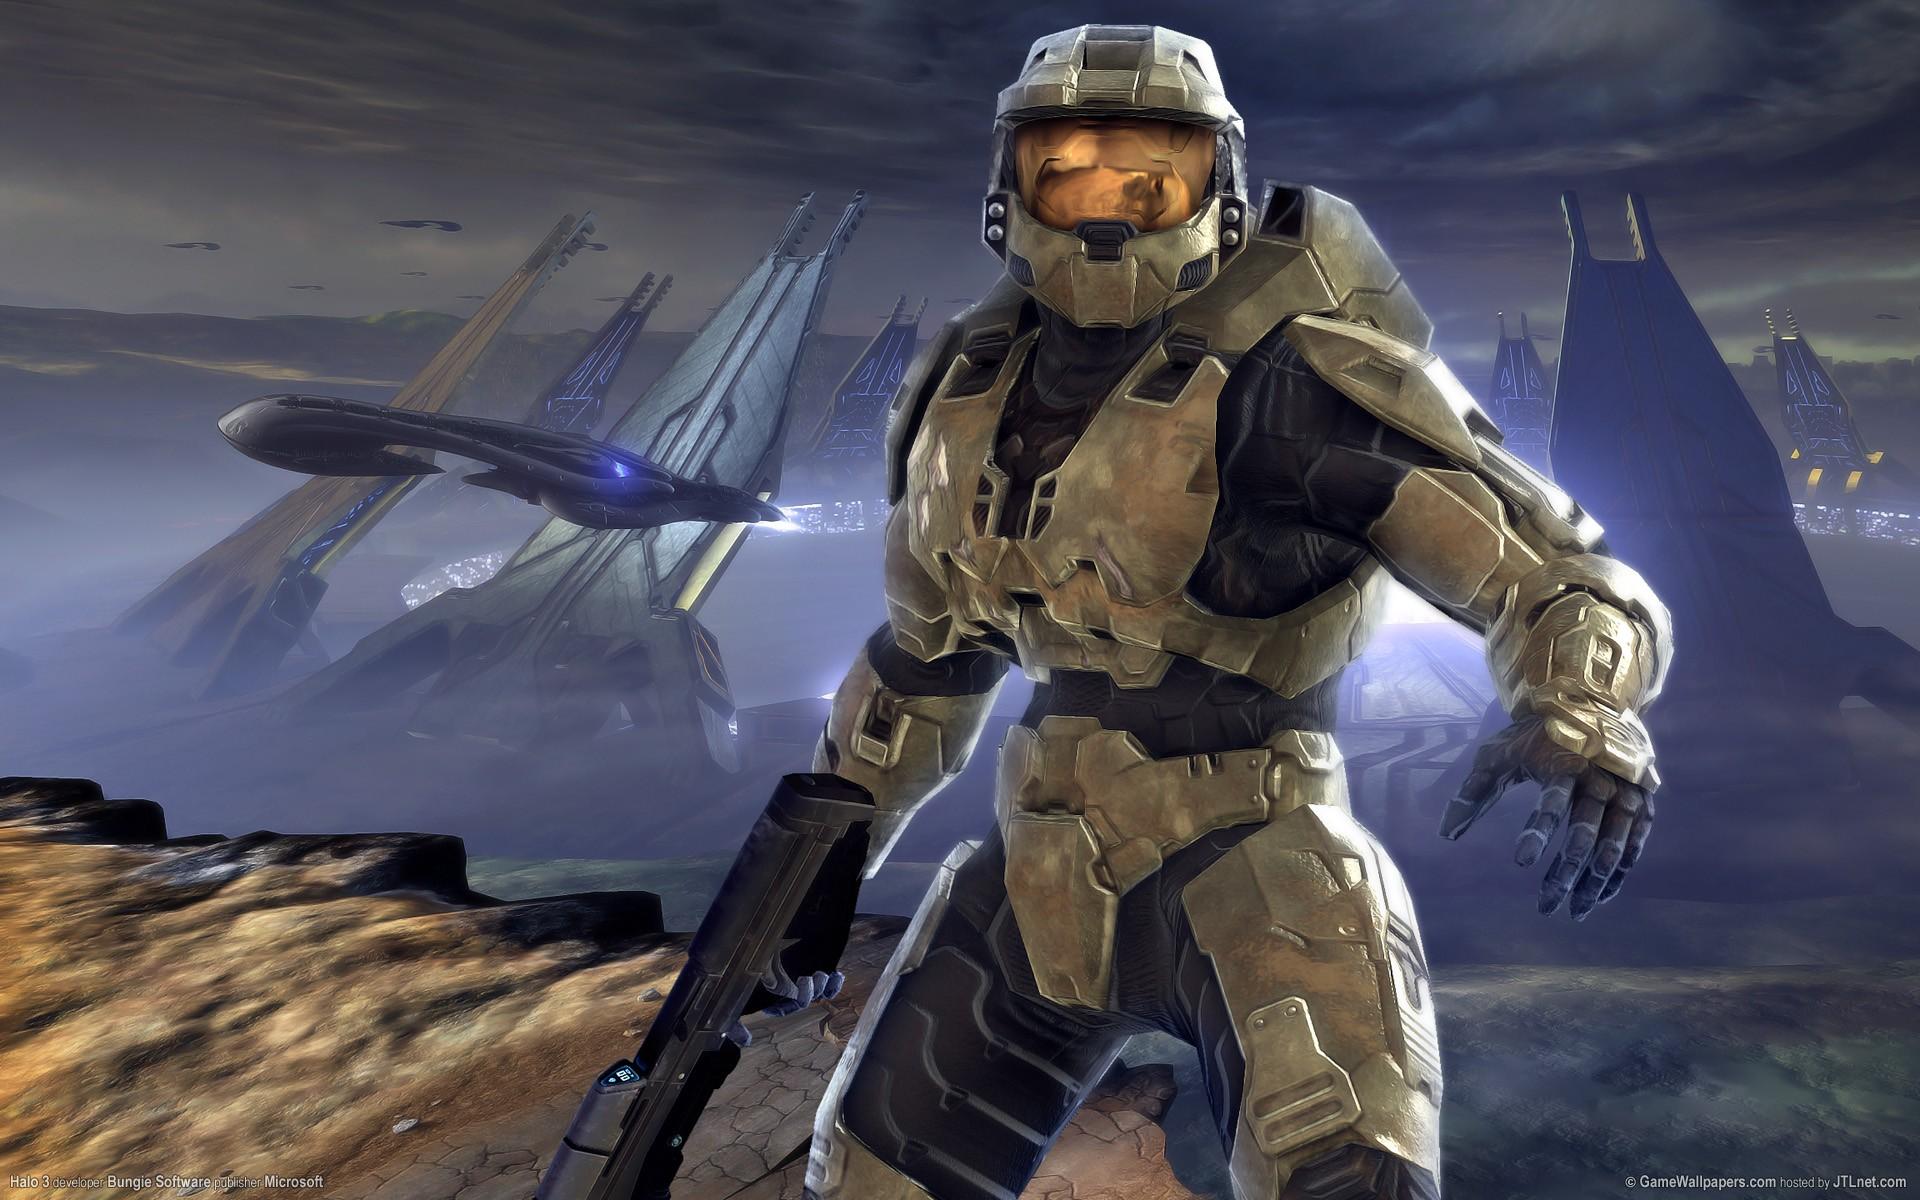 Halo 3 wallpaper ·① Download free beautiful full HD ...